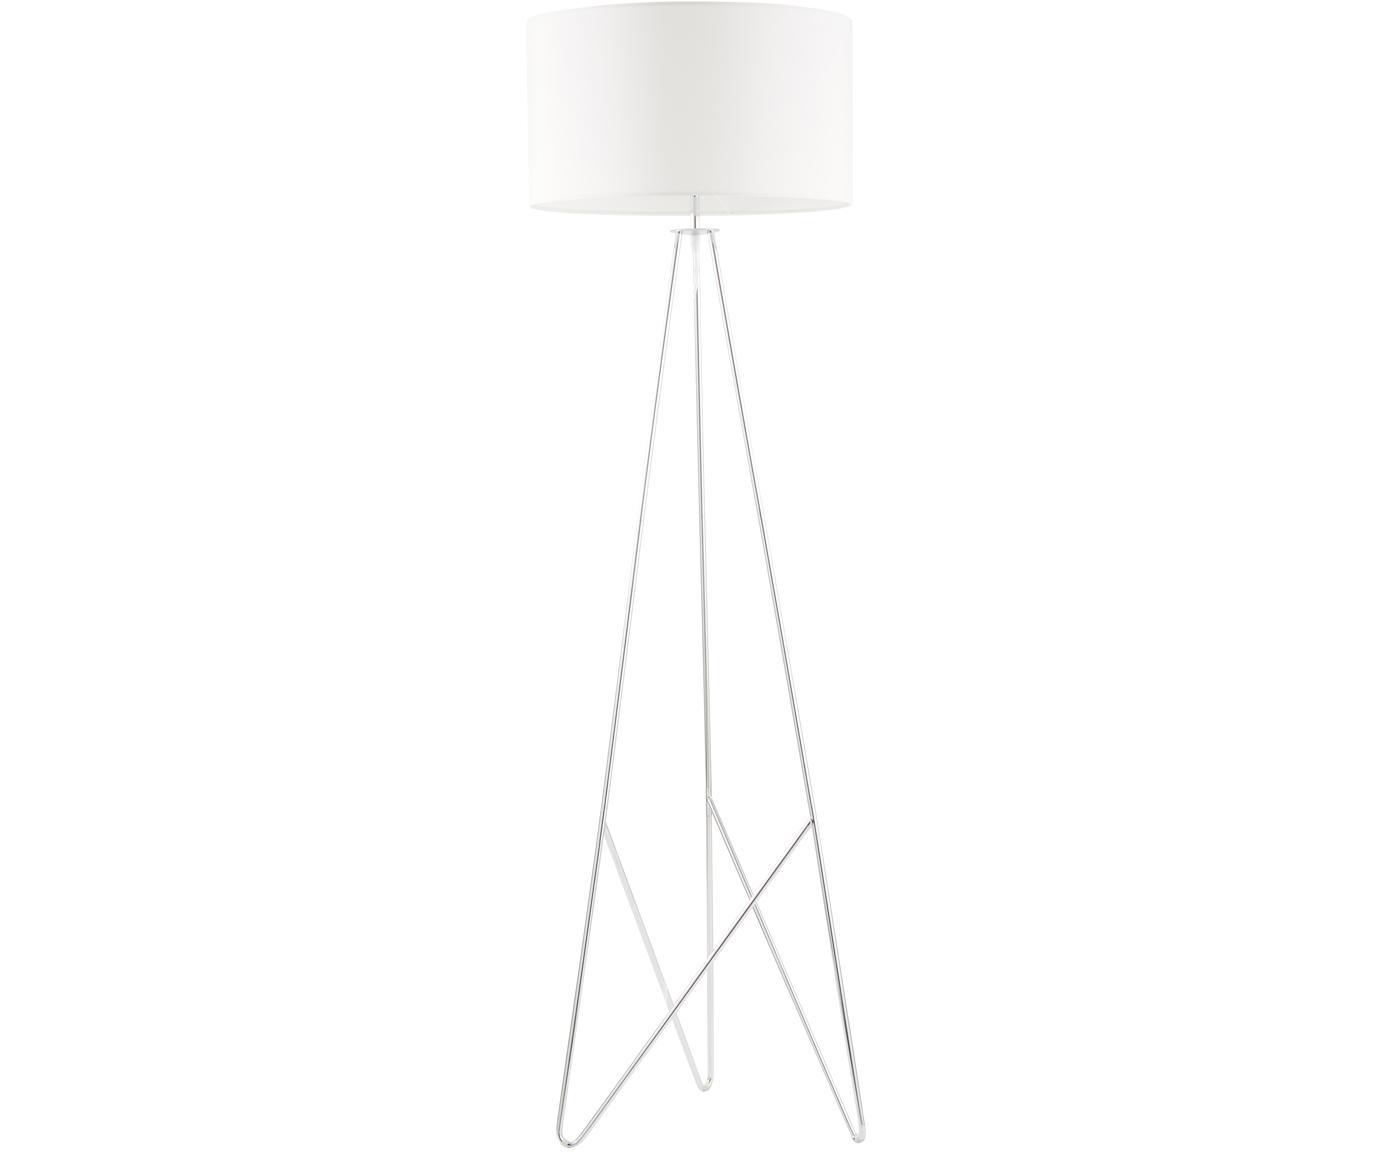 Stehlampe Jessica, Lampenschirm: Textil, Weiss, Chrom, Ø 45 x H 155 cm